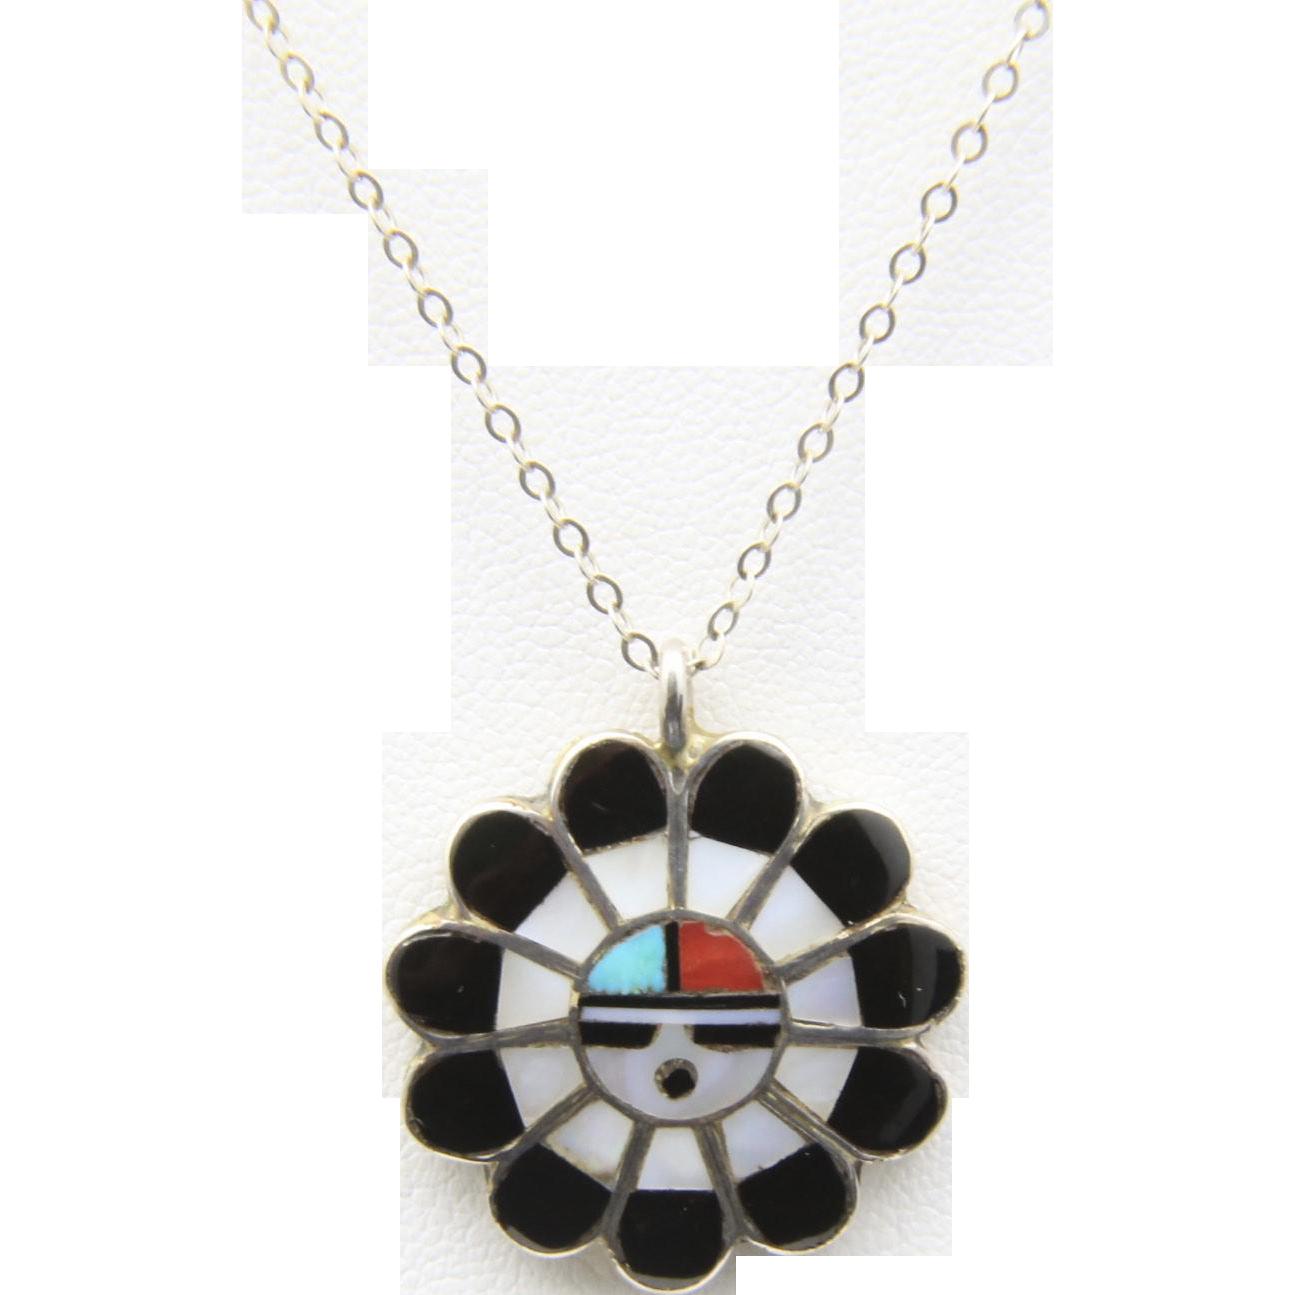 Vintage Zuni Sunface God Pendant Necklace Onyx Turquoise  Coral Sun Face Inlay